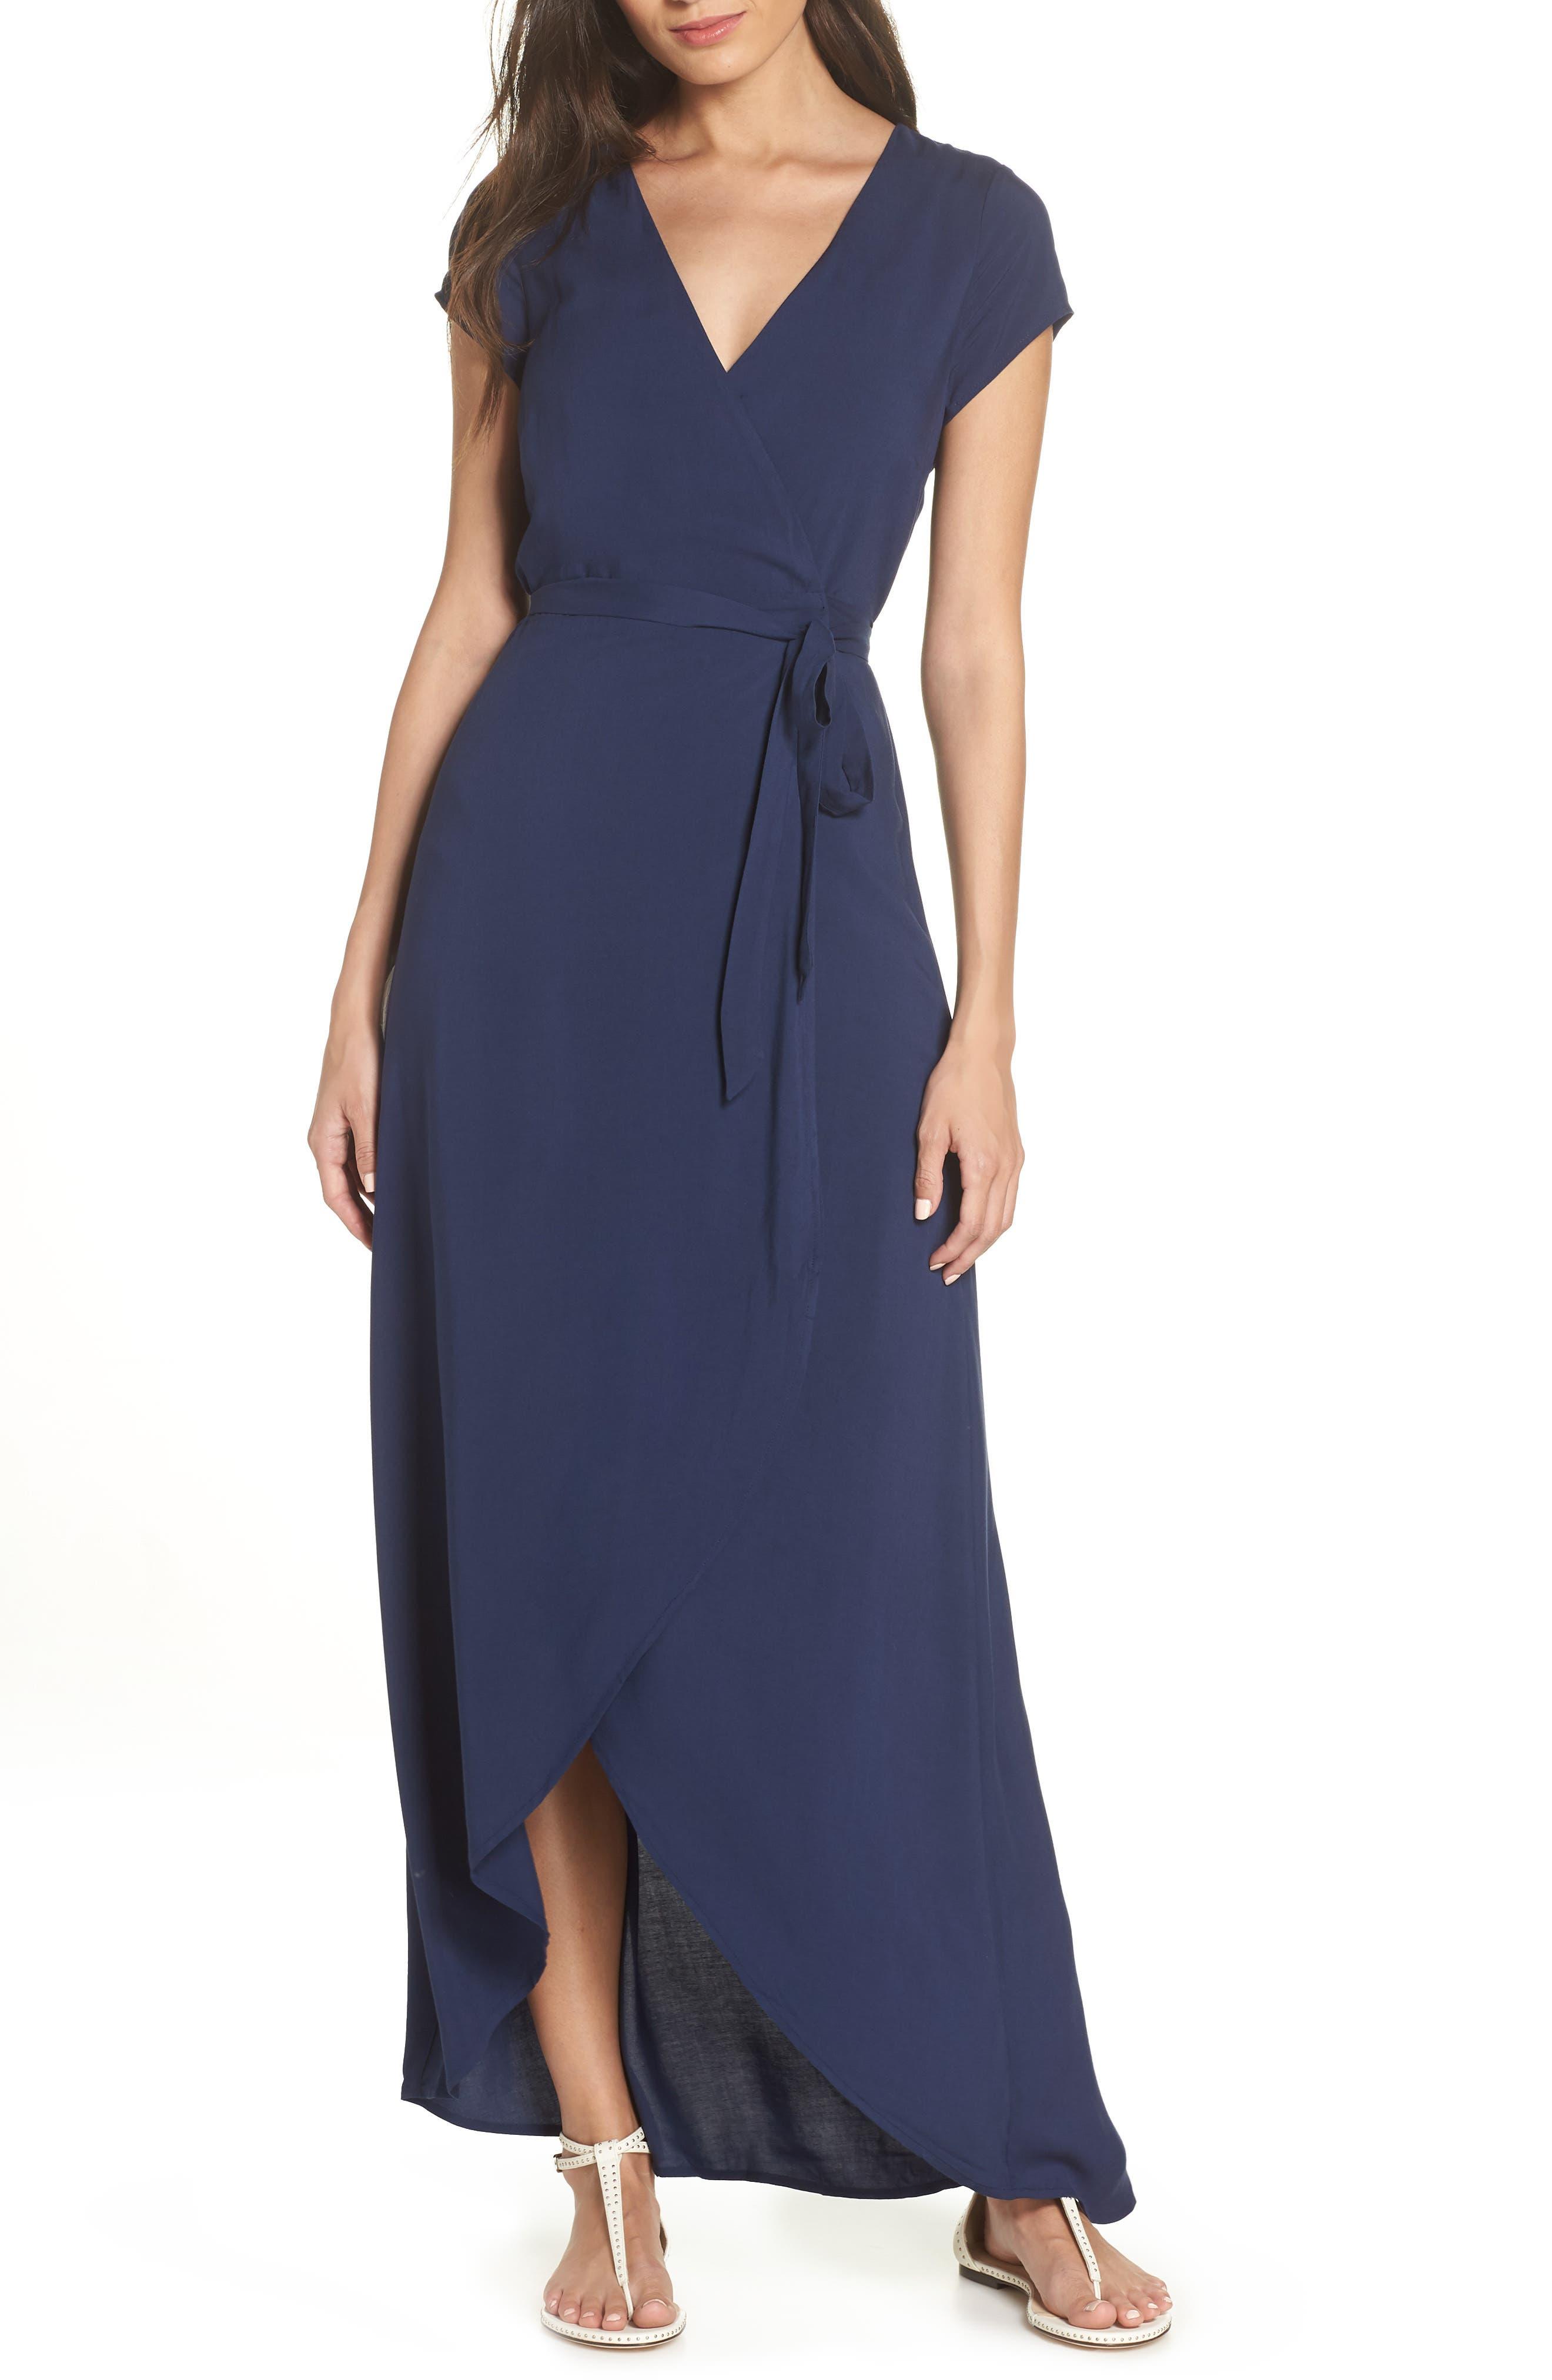 Goa Cover-Up Maxi Wrap Dress,                             Main thumbnail 1, color,                             MIDNIGHT BLUE